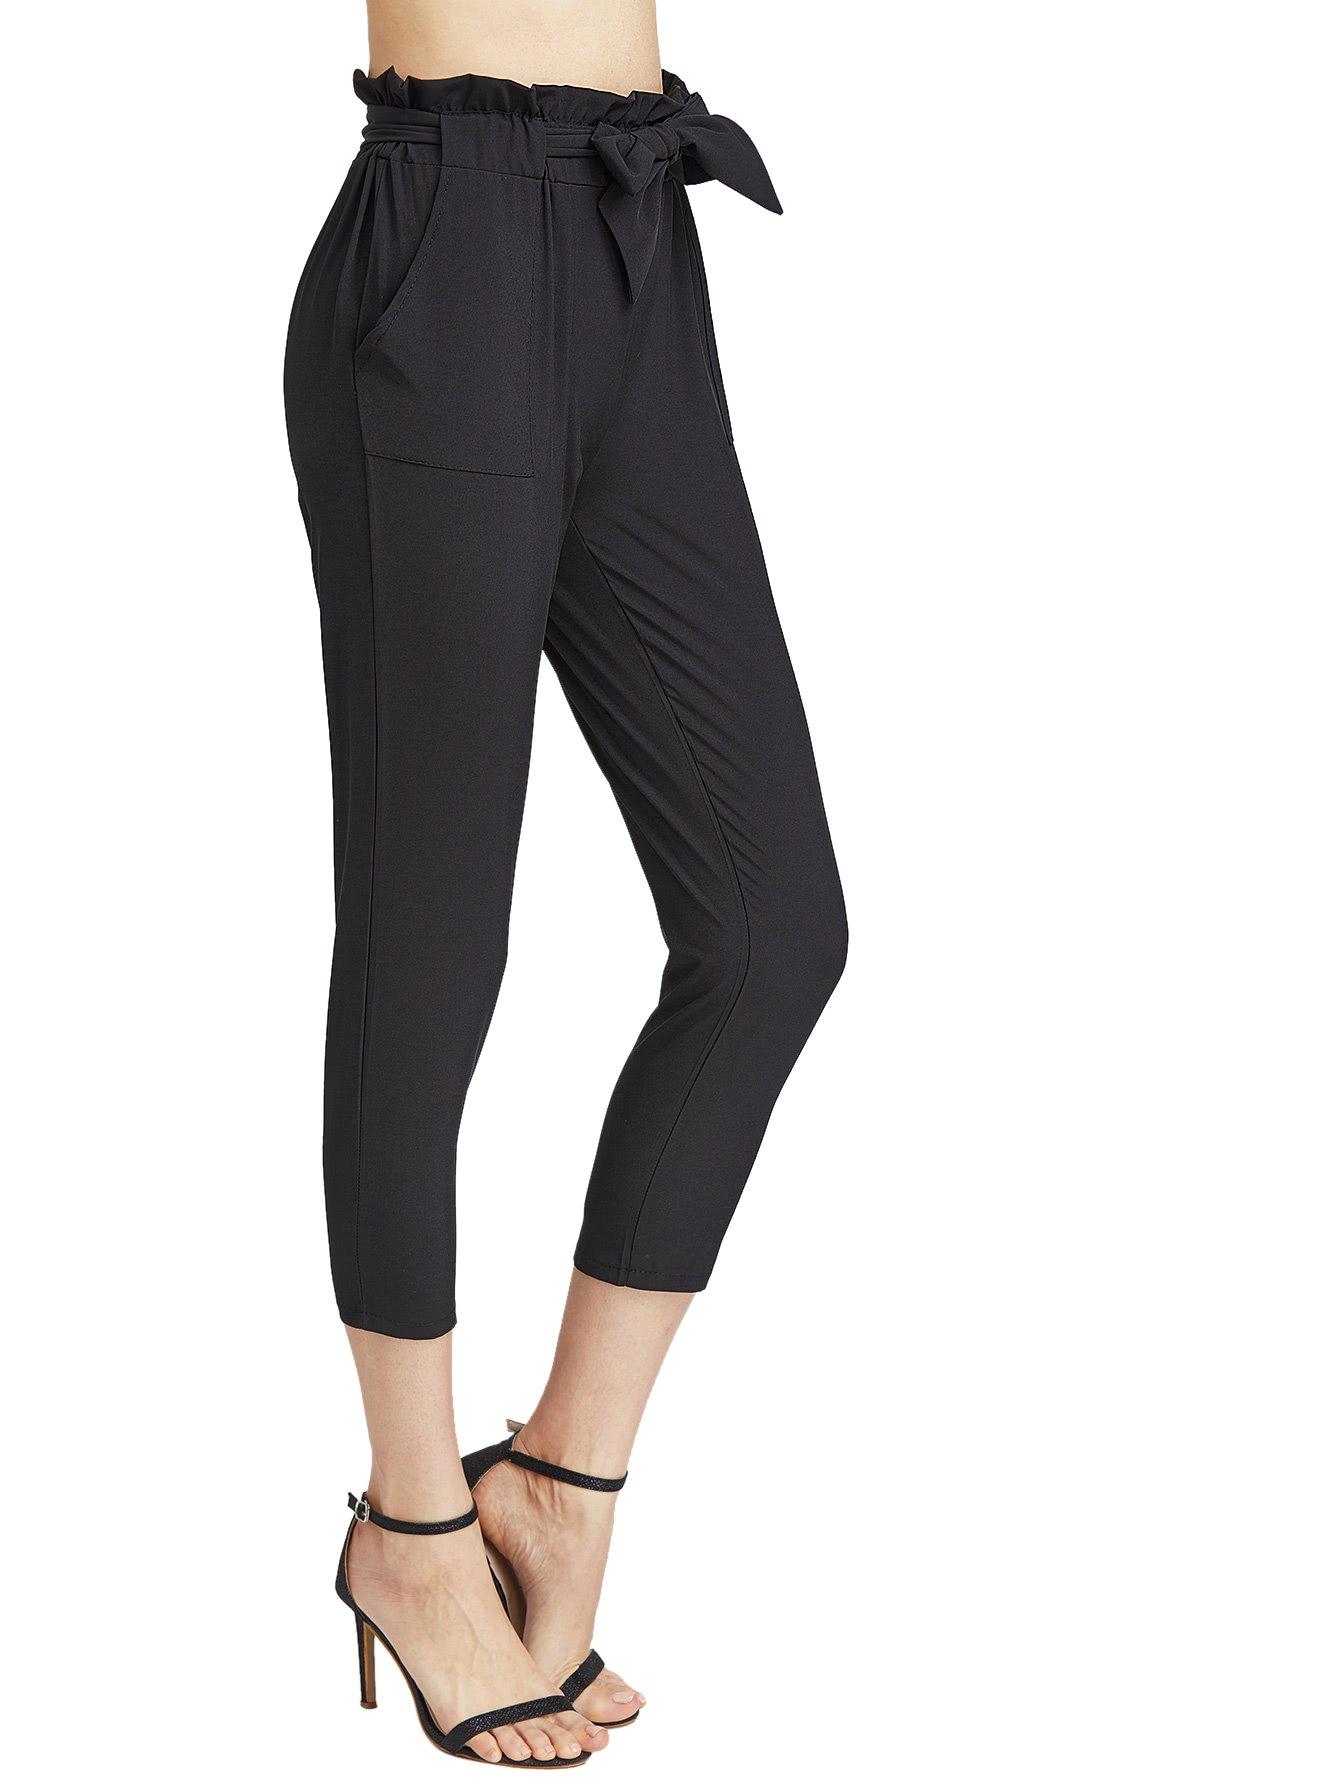 SweatyRocks Women's Skinny Straight Leg Belted Casual Pants Capris with Pockets Black XL